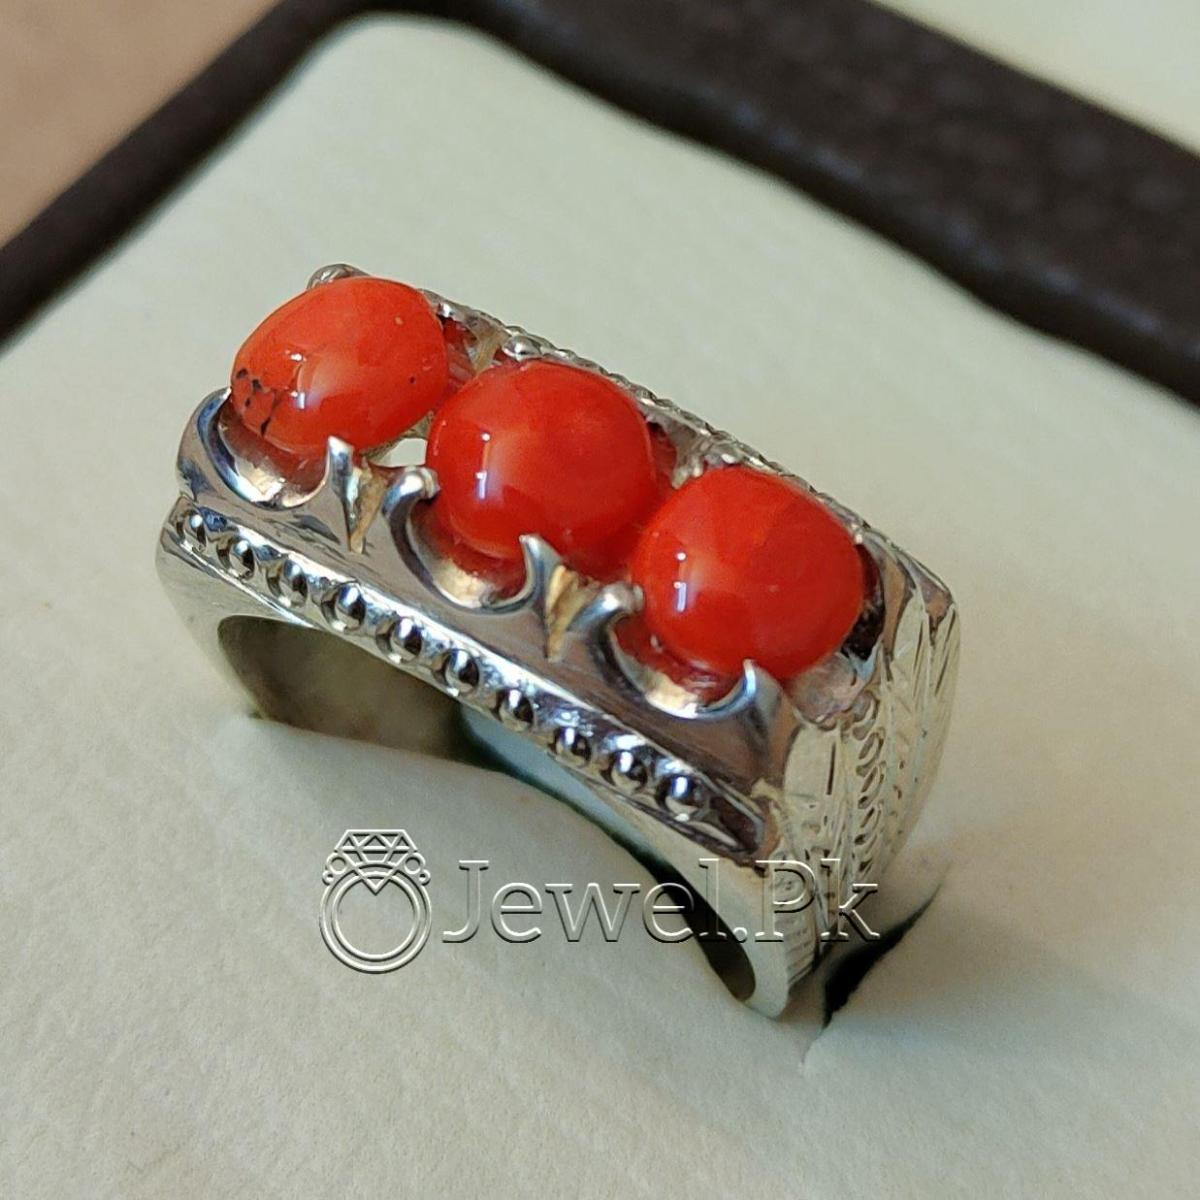 Natural Coral Marjan Ring Handmade 925 Silver Marjan stone 3 natural gemstones pakistan + 925 silver jewelry online